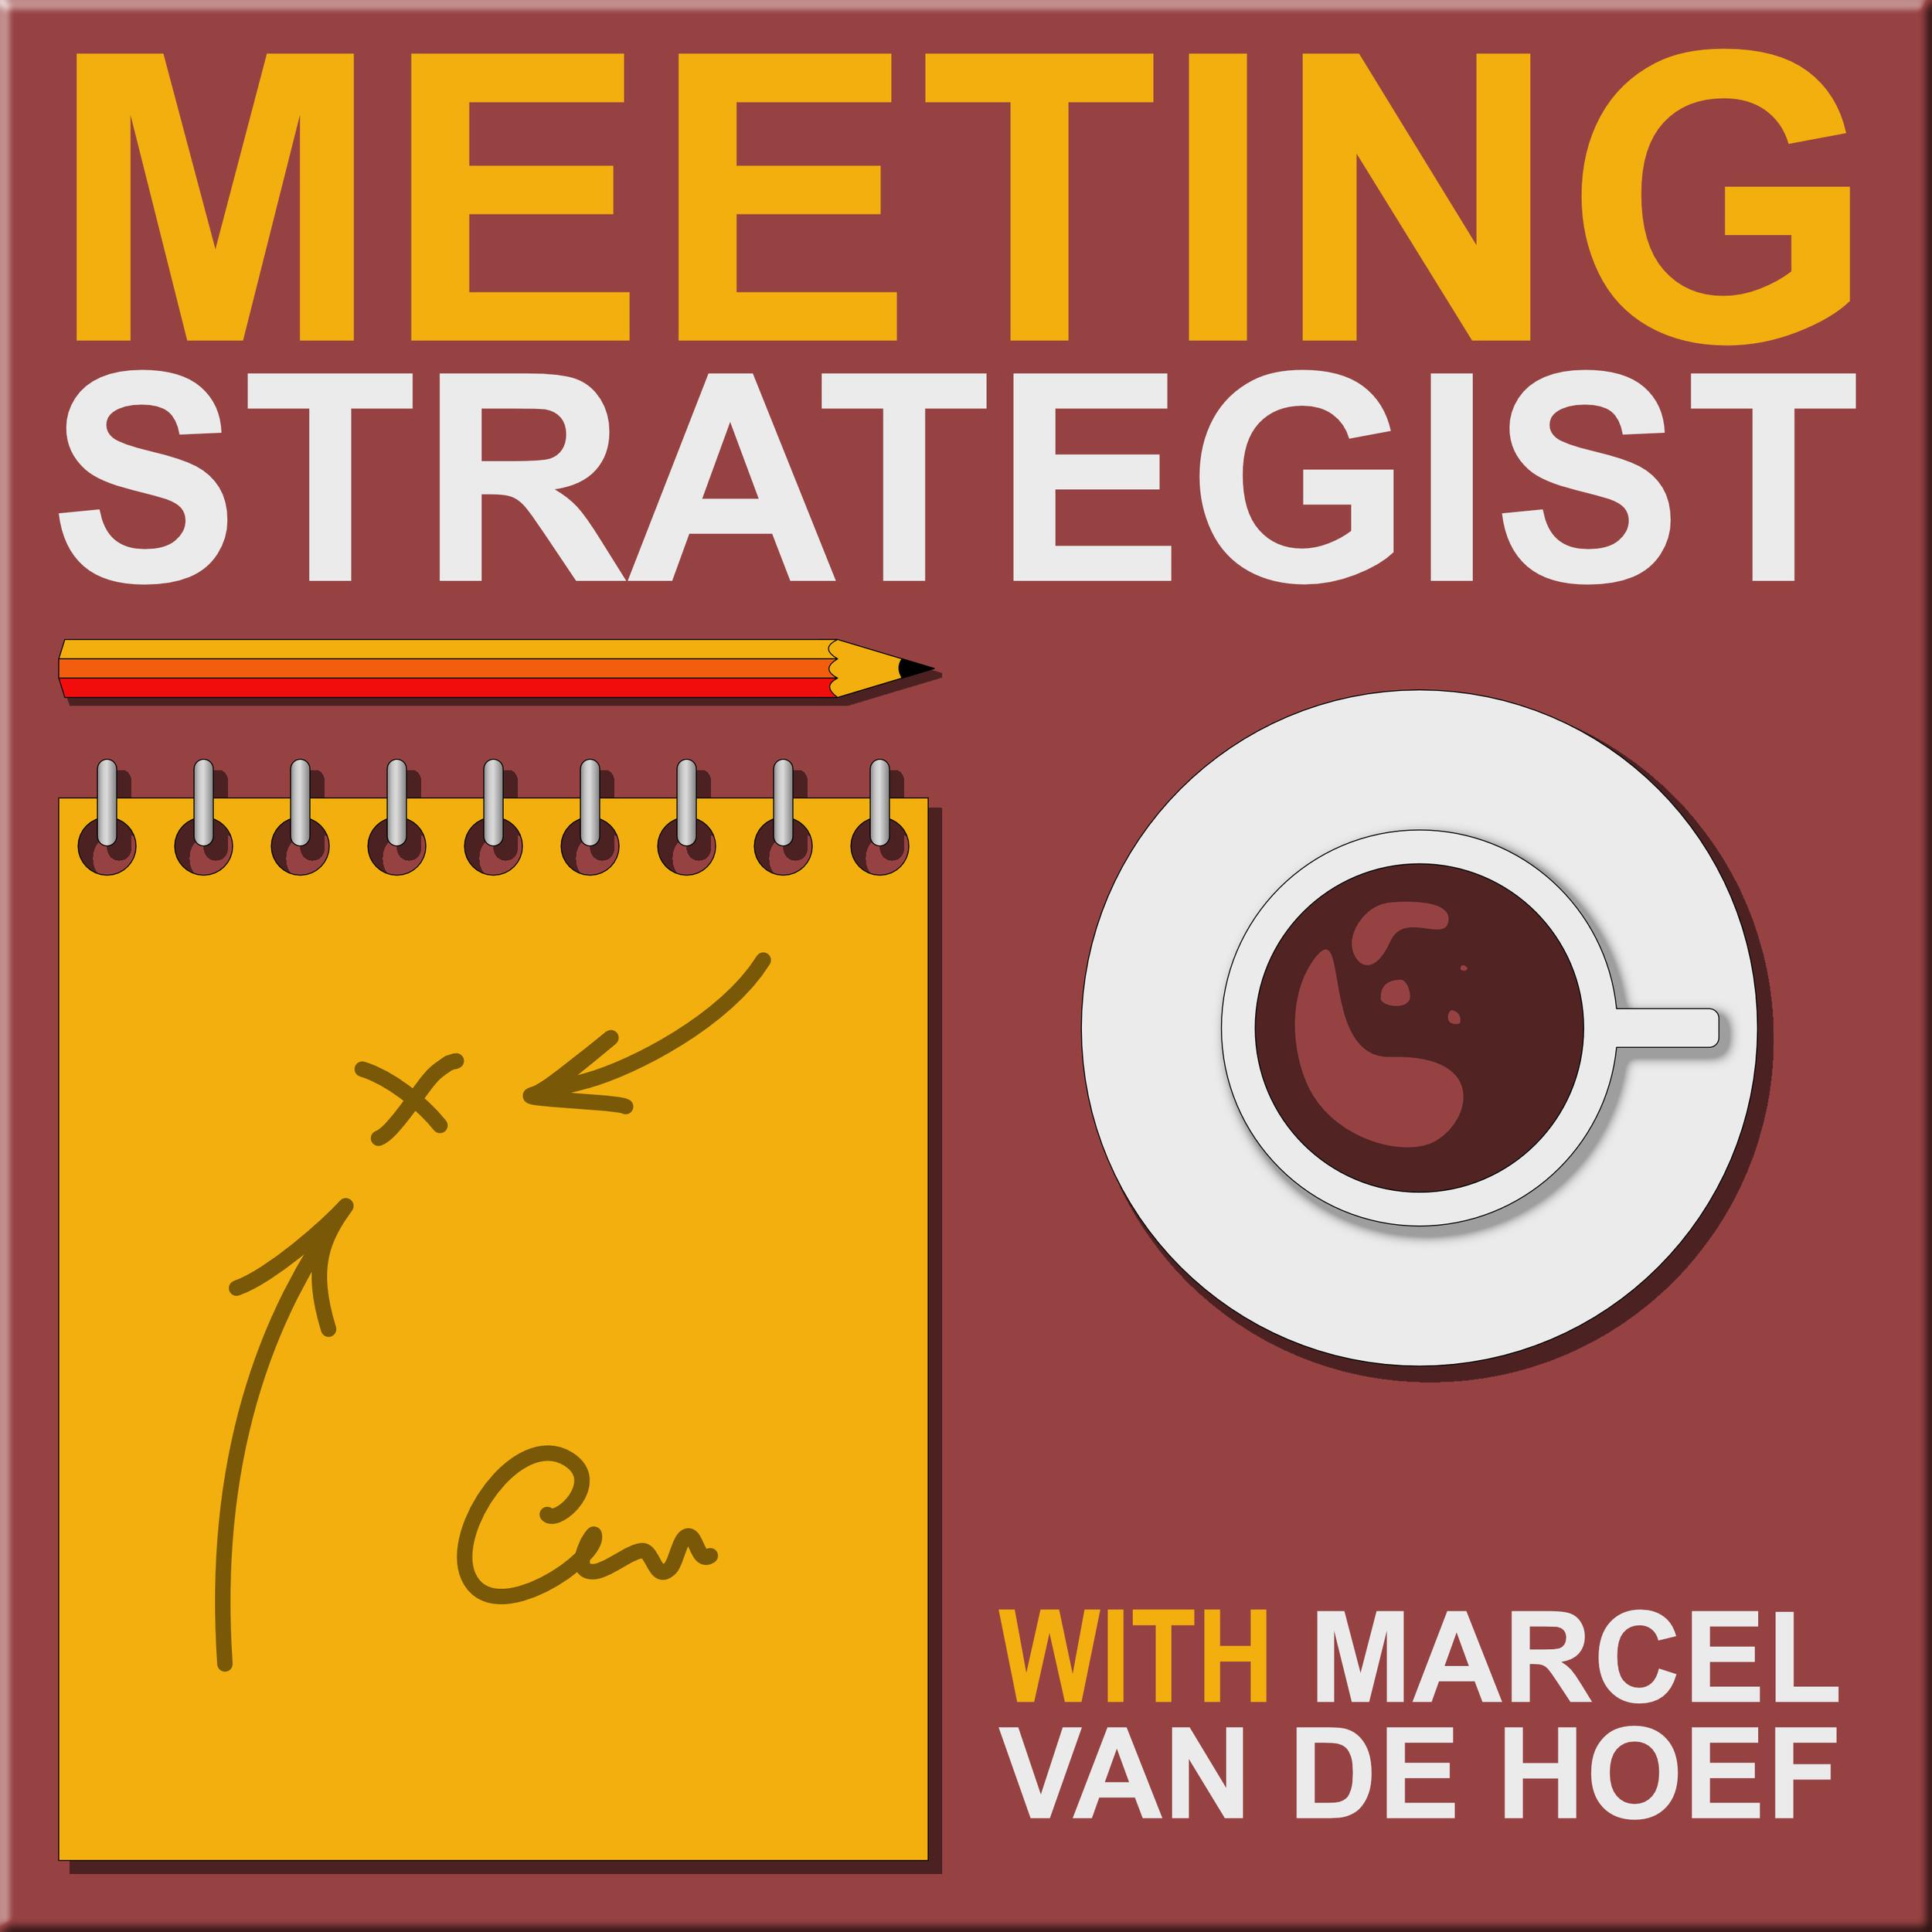 Meeting Strategist thumb 008 desk v6.png